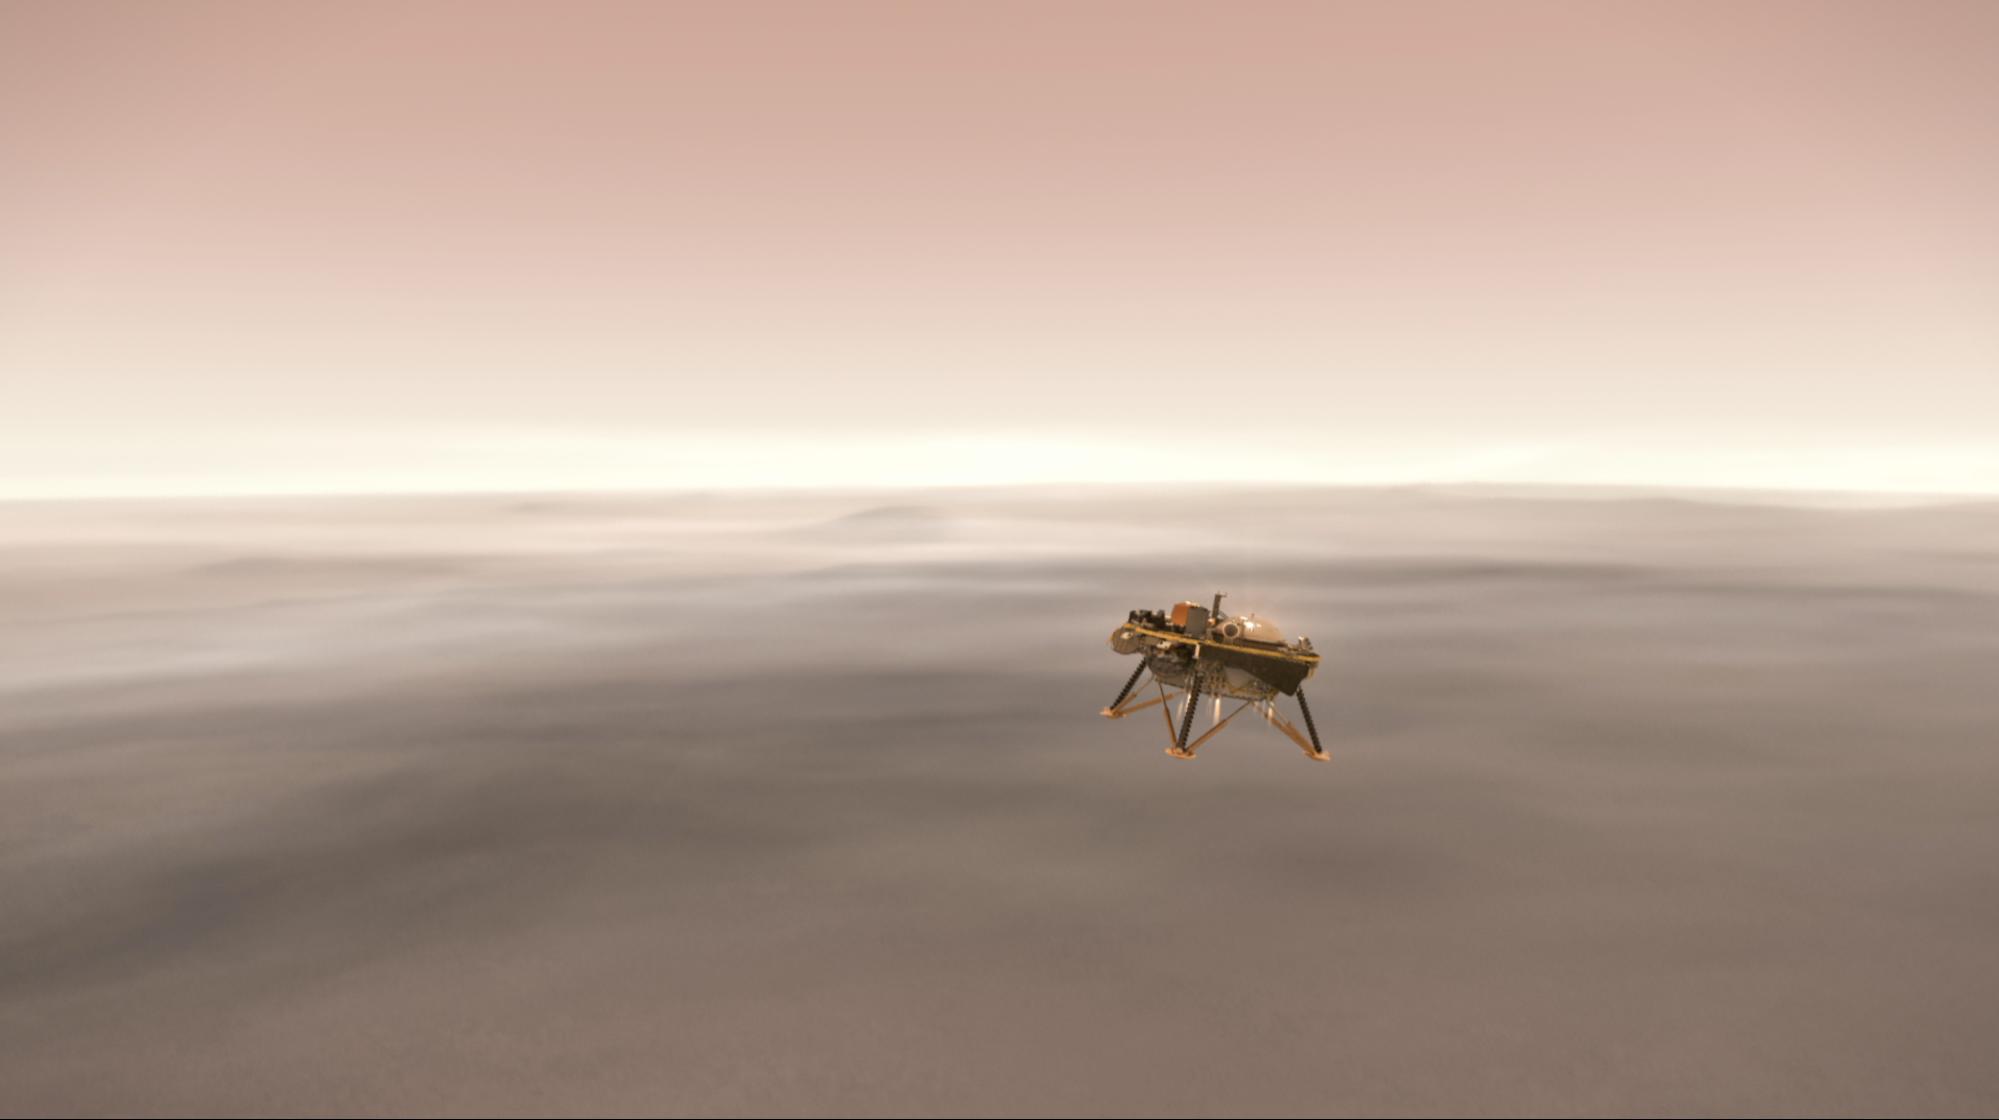 mars insight landing press kit - photo #19